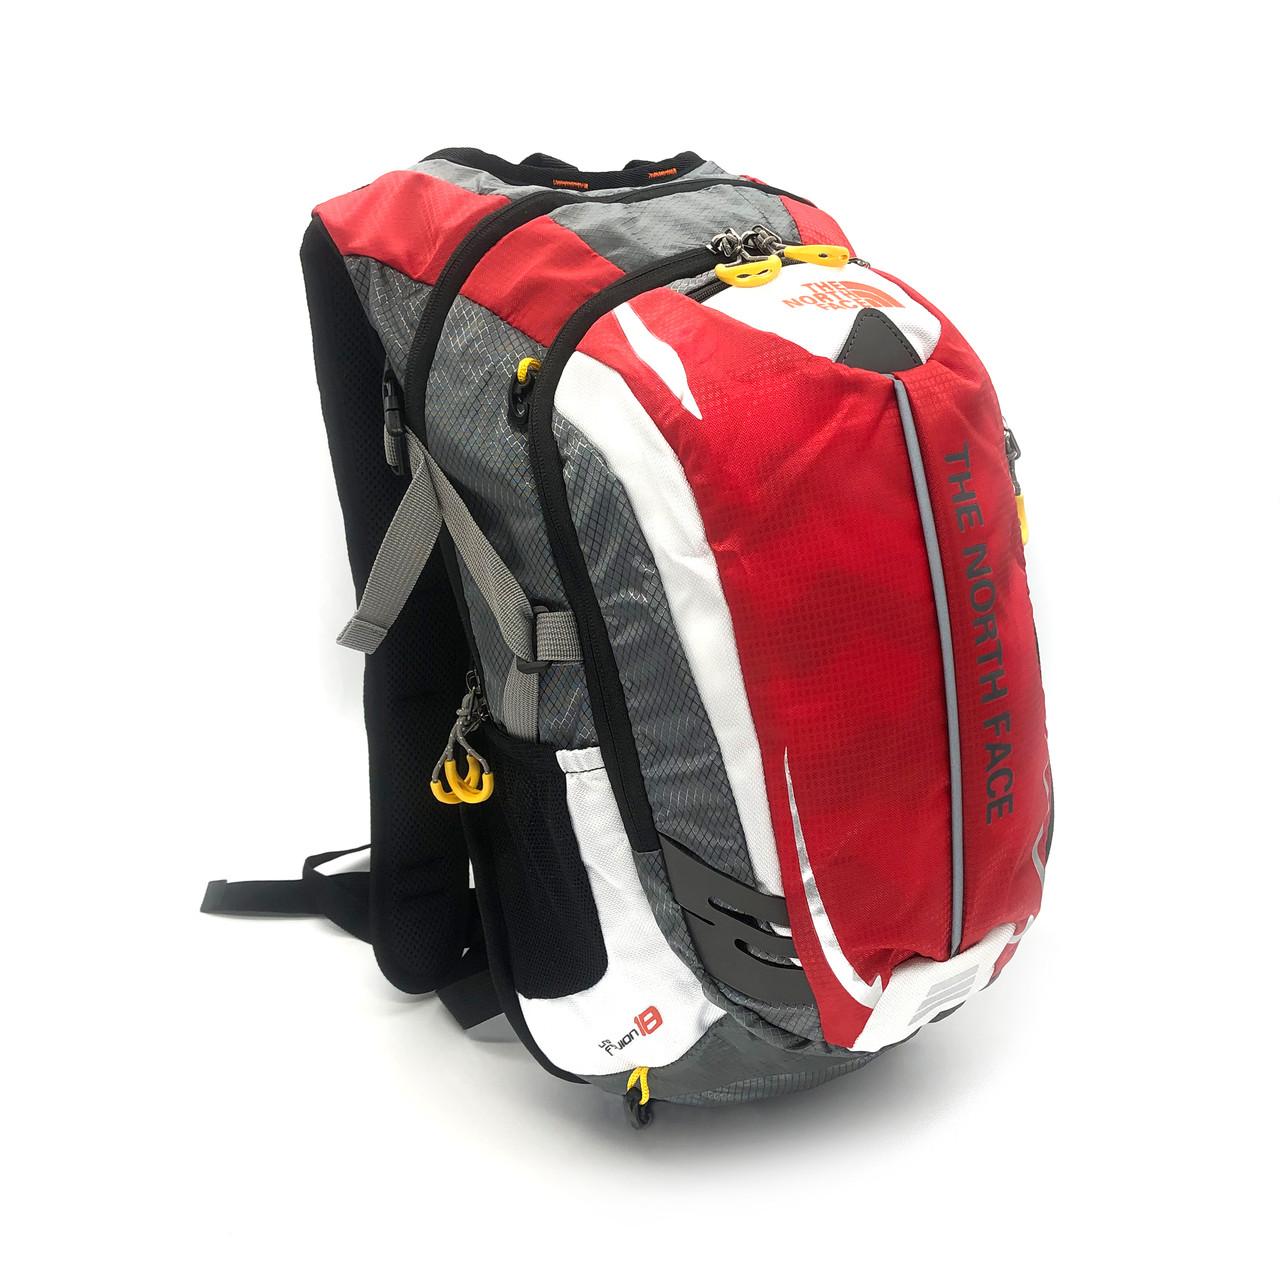 Спортивный рюкзак для бега - фото 6